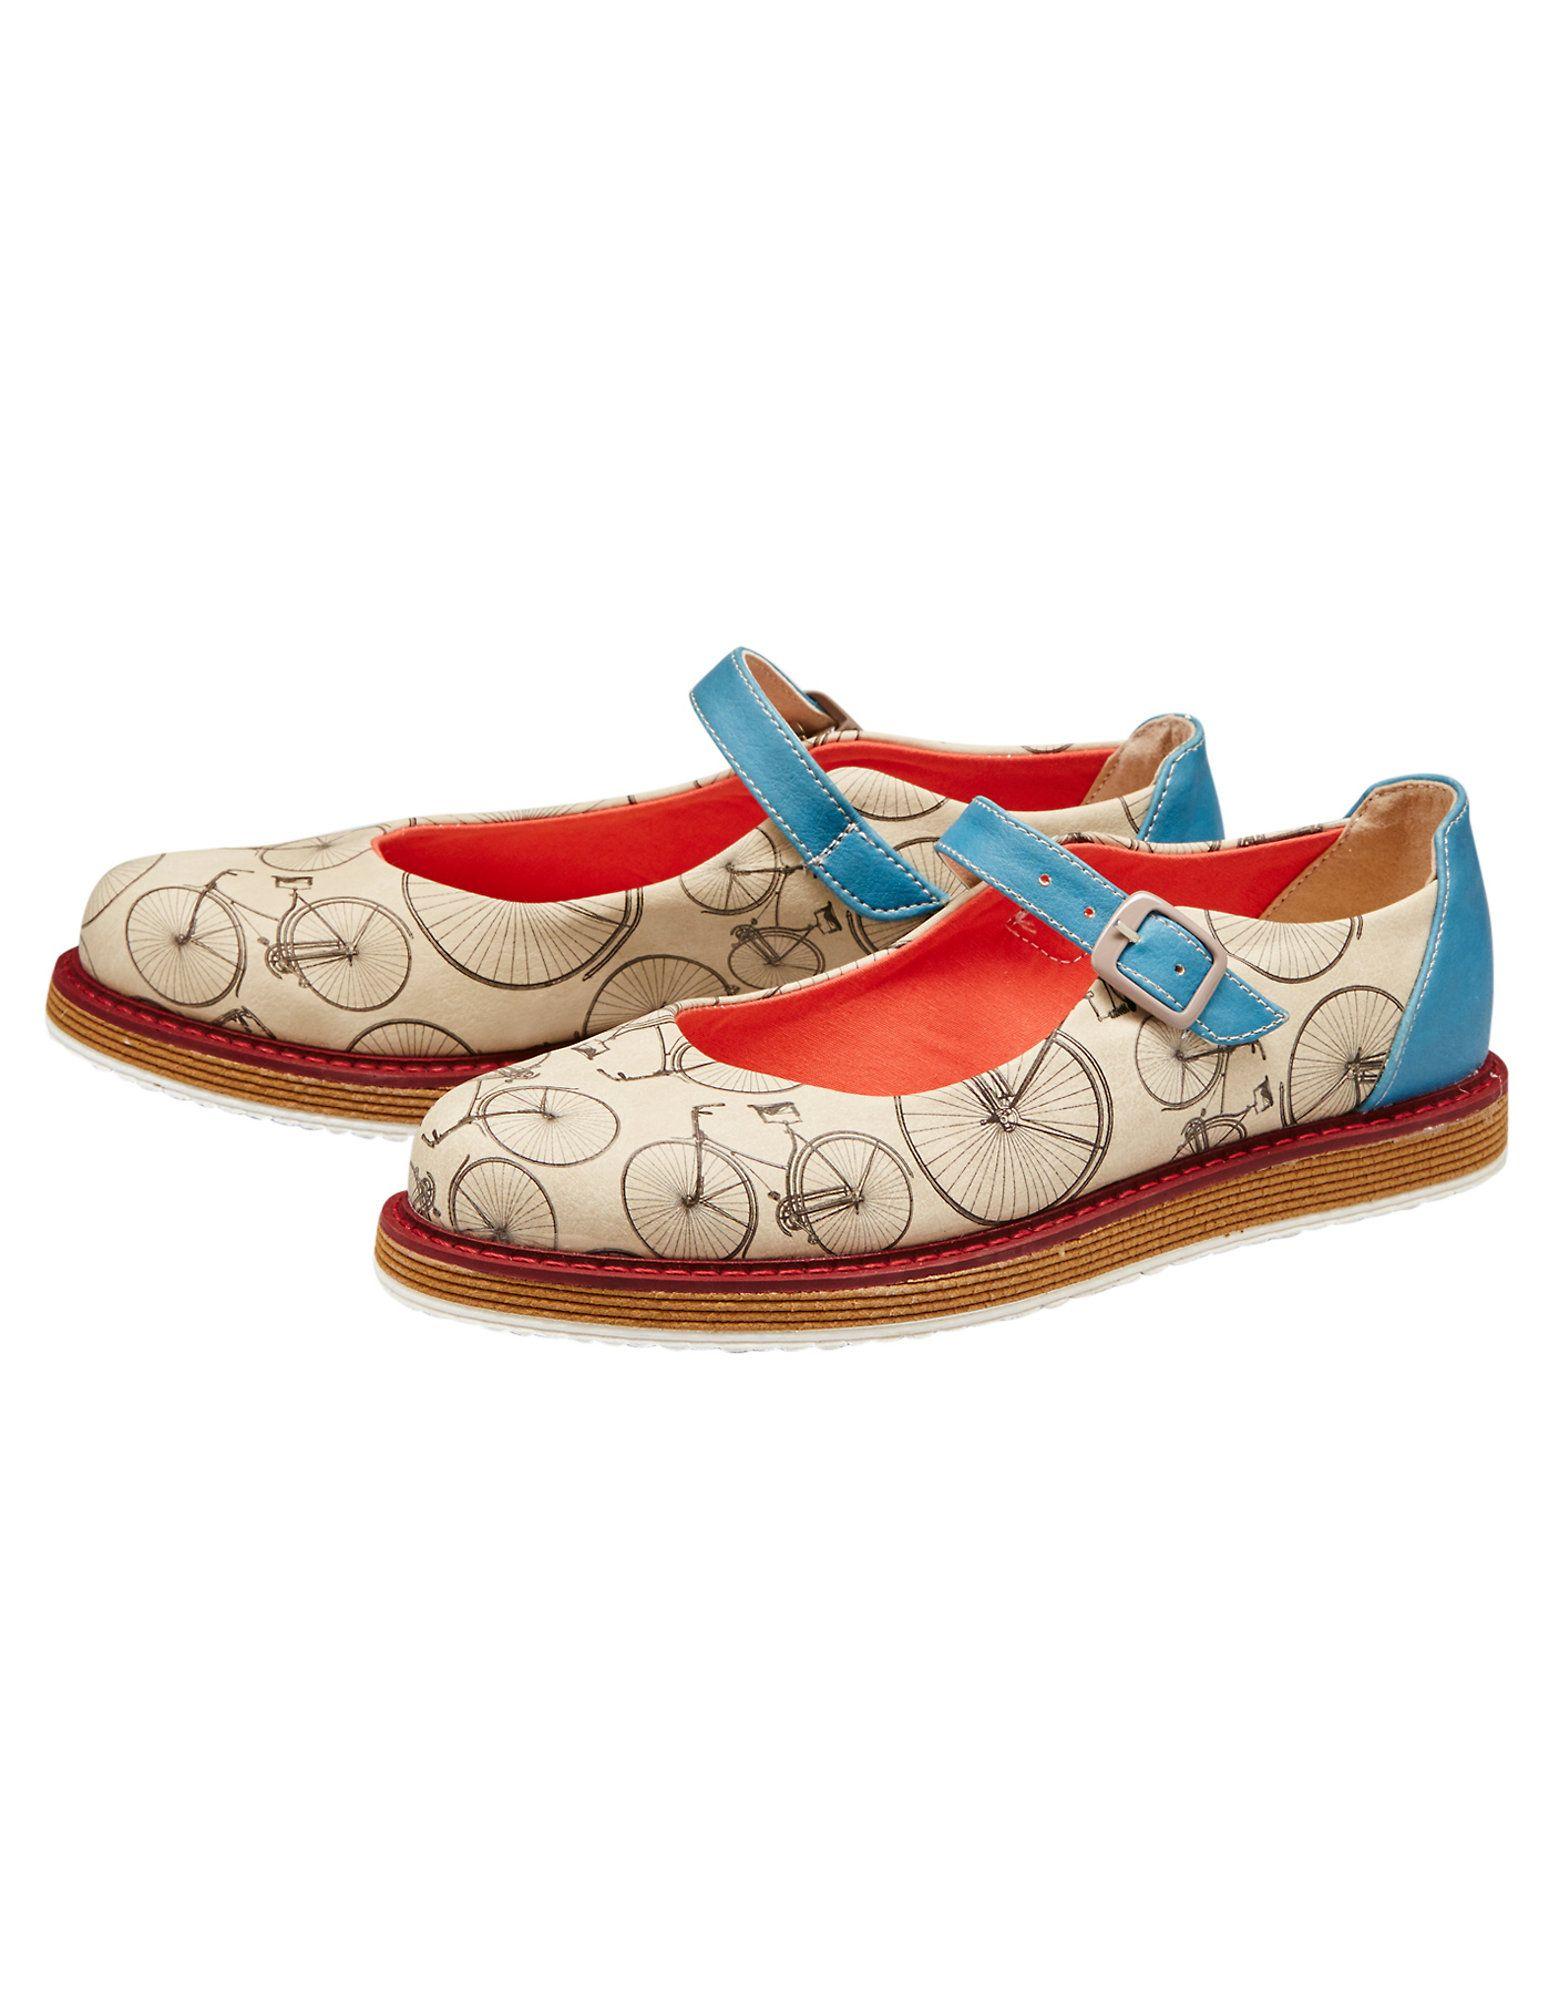 Dogo-Shoes Damen Spangenschuhe Kitty, Bunt